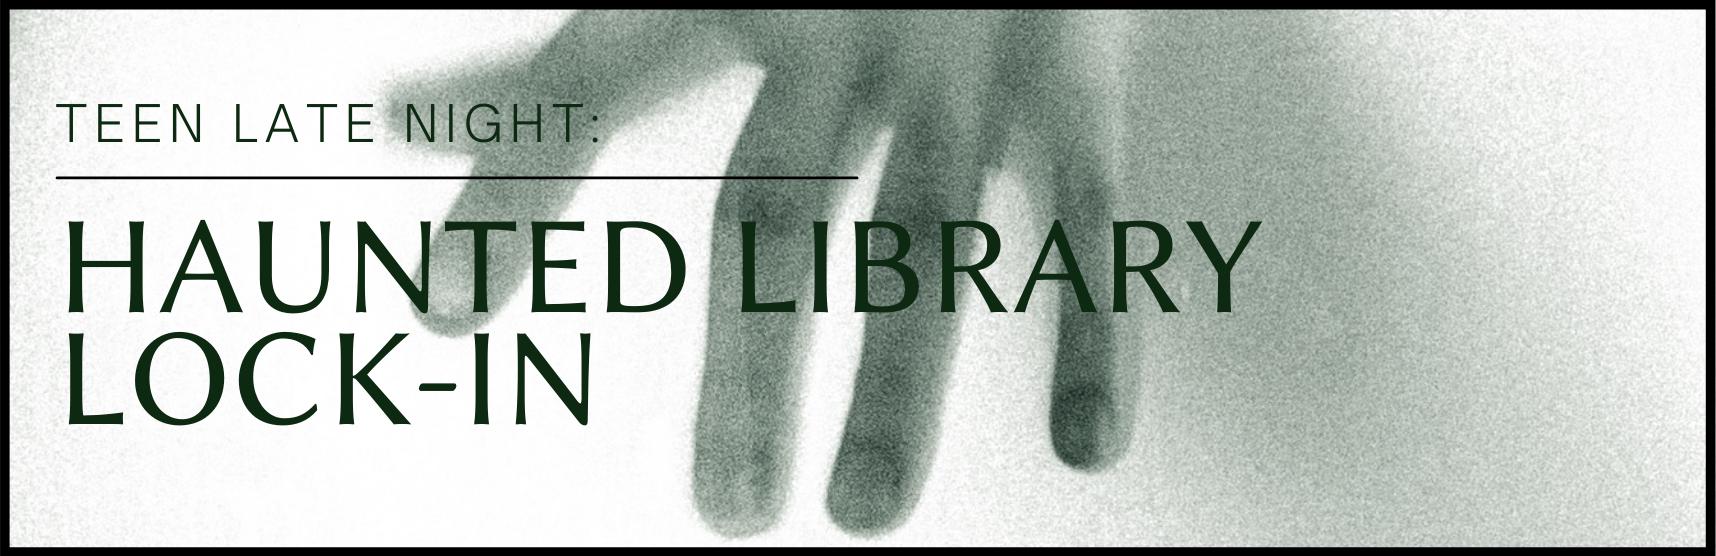 Teen Late Night: Haunted Library Lock-In